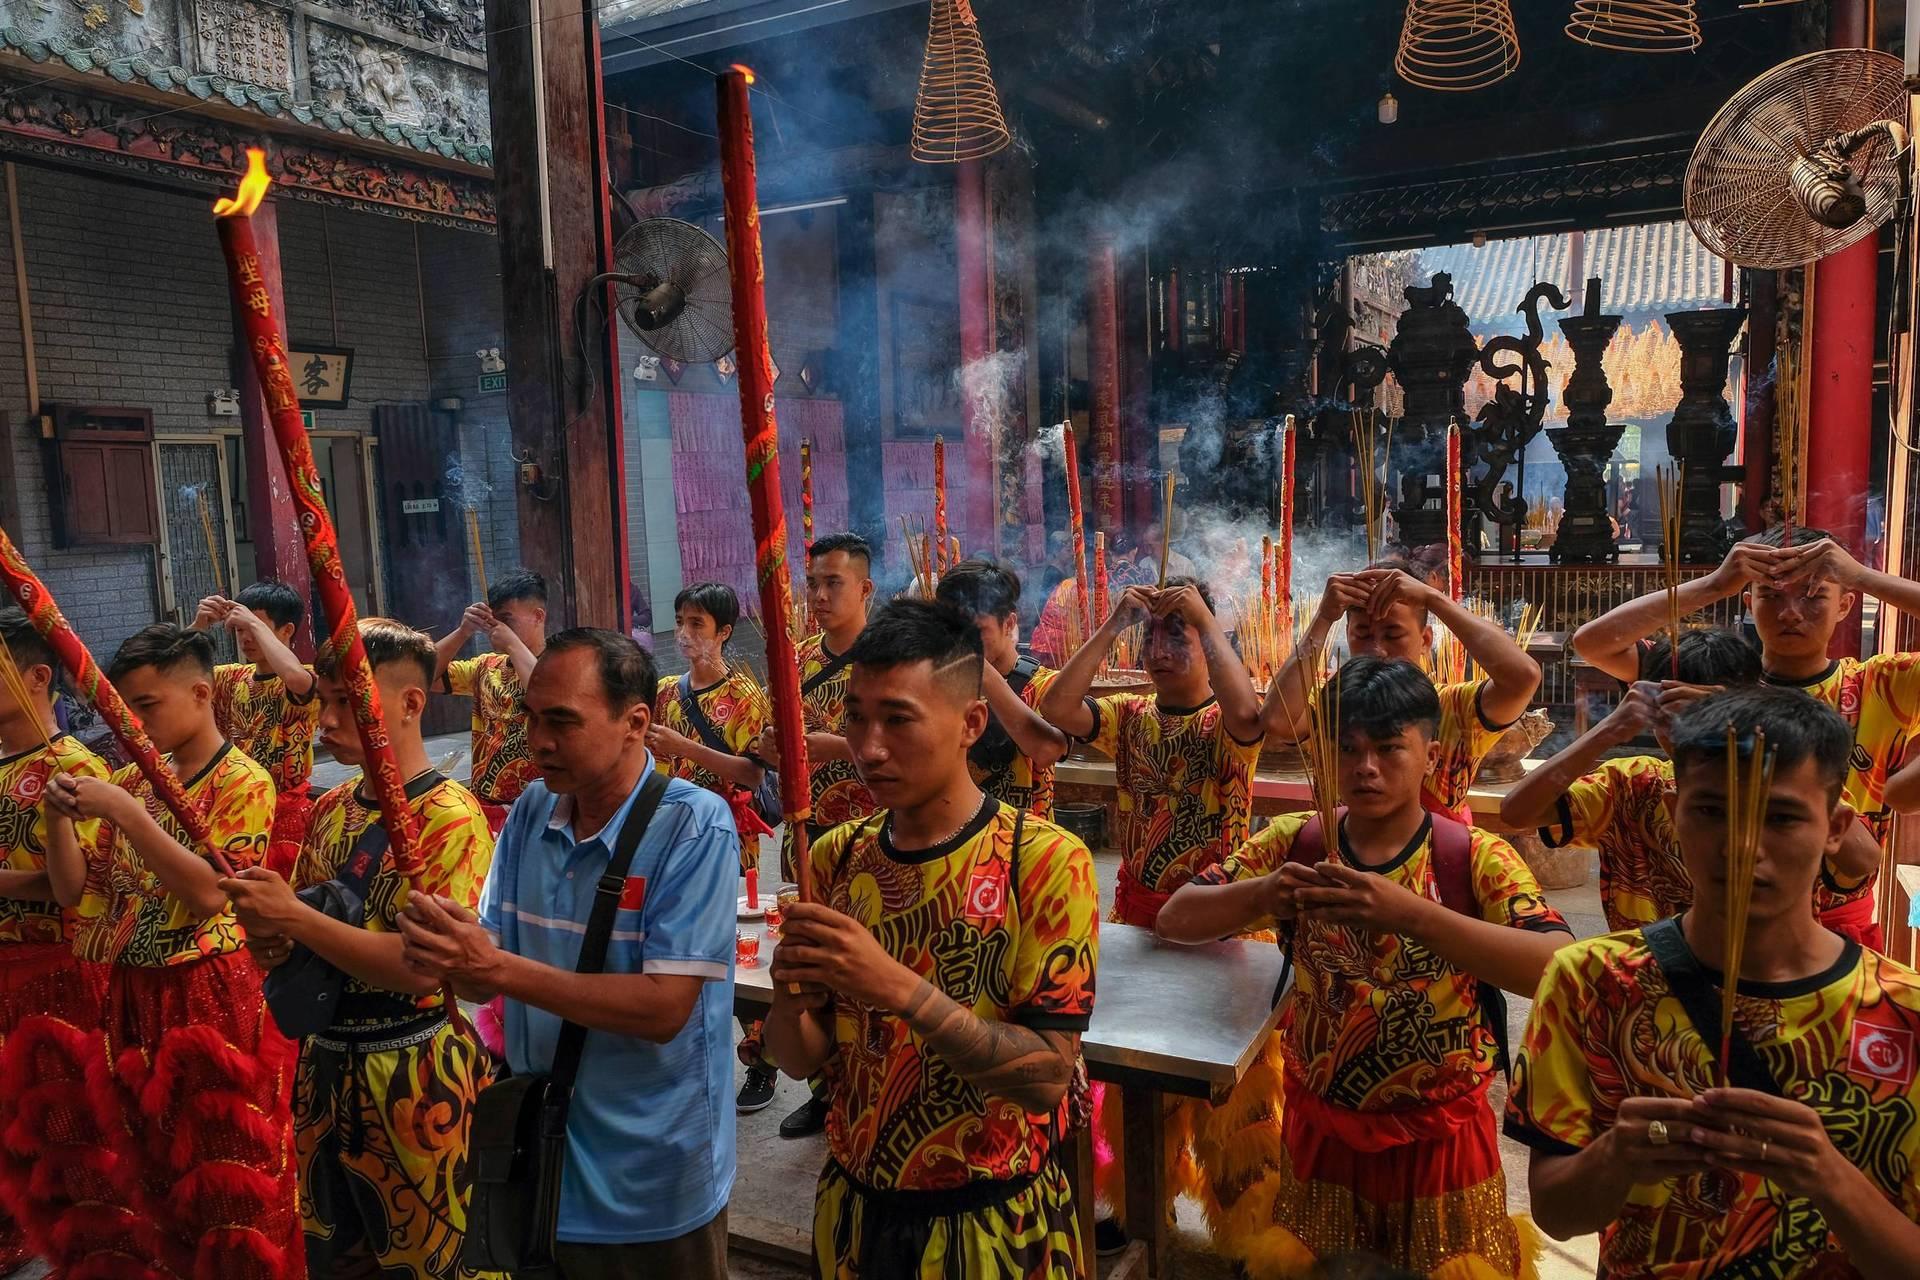 Lion Dance Groups Get Roaring in Saigon's Chinatown